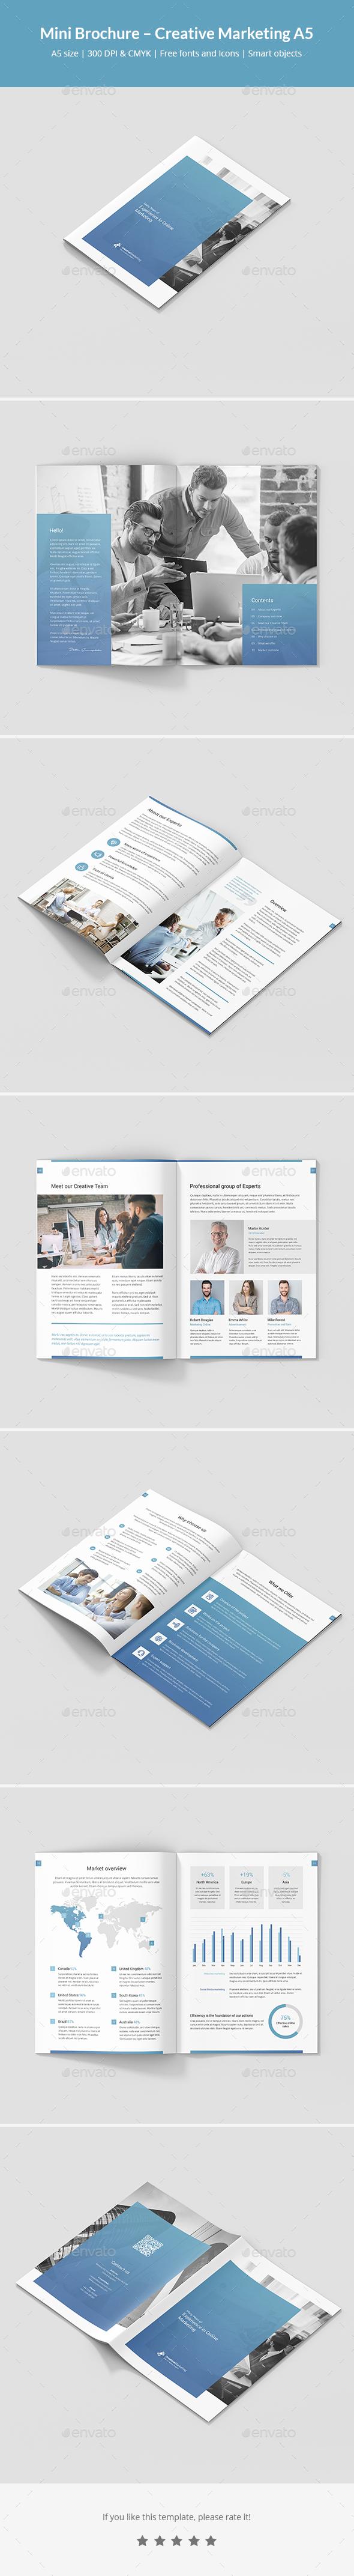 Mini Brochure – Creative Marketing A5 - Corporate Brochures